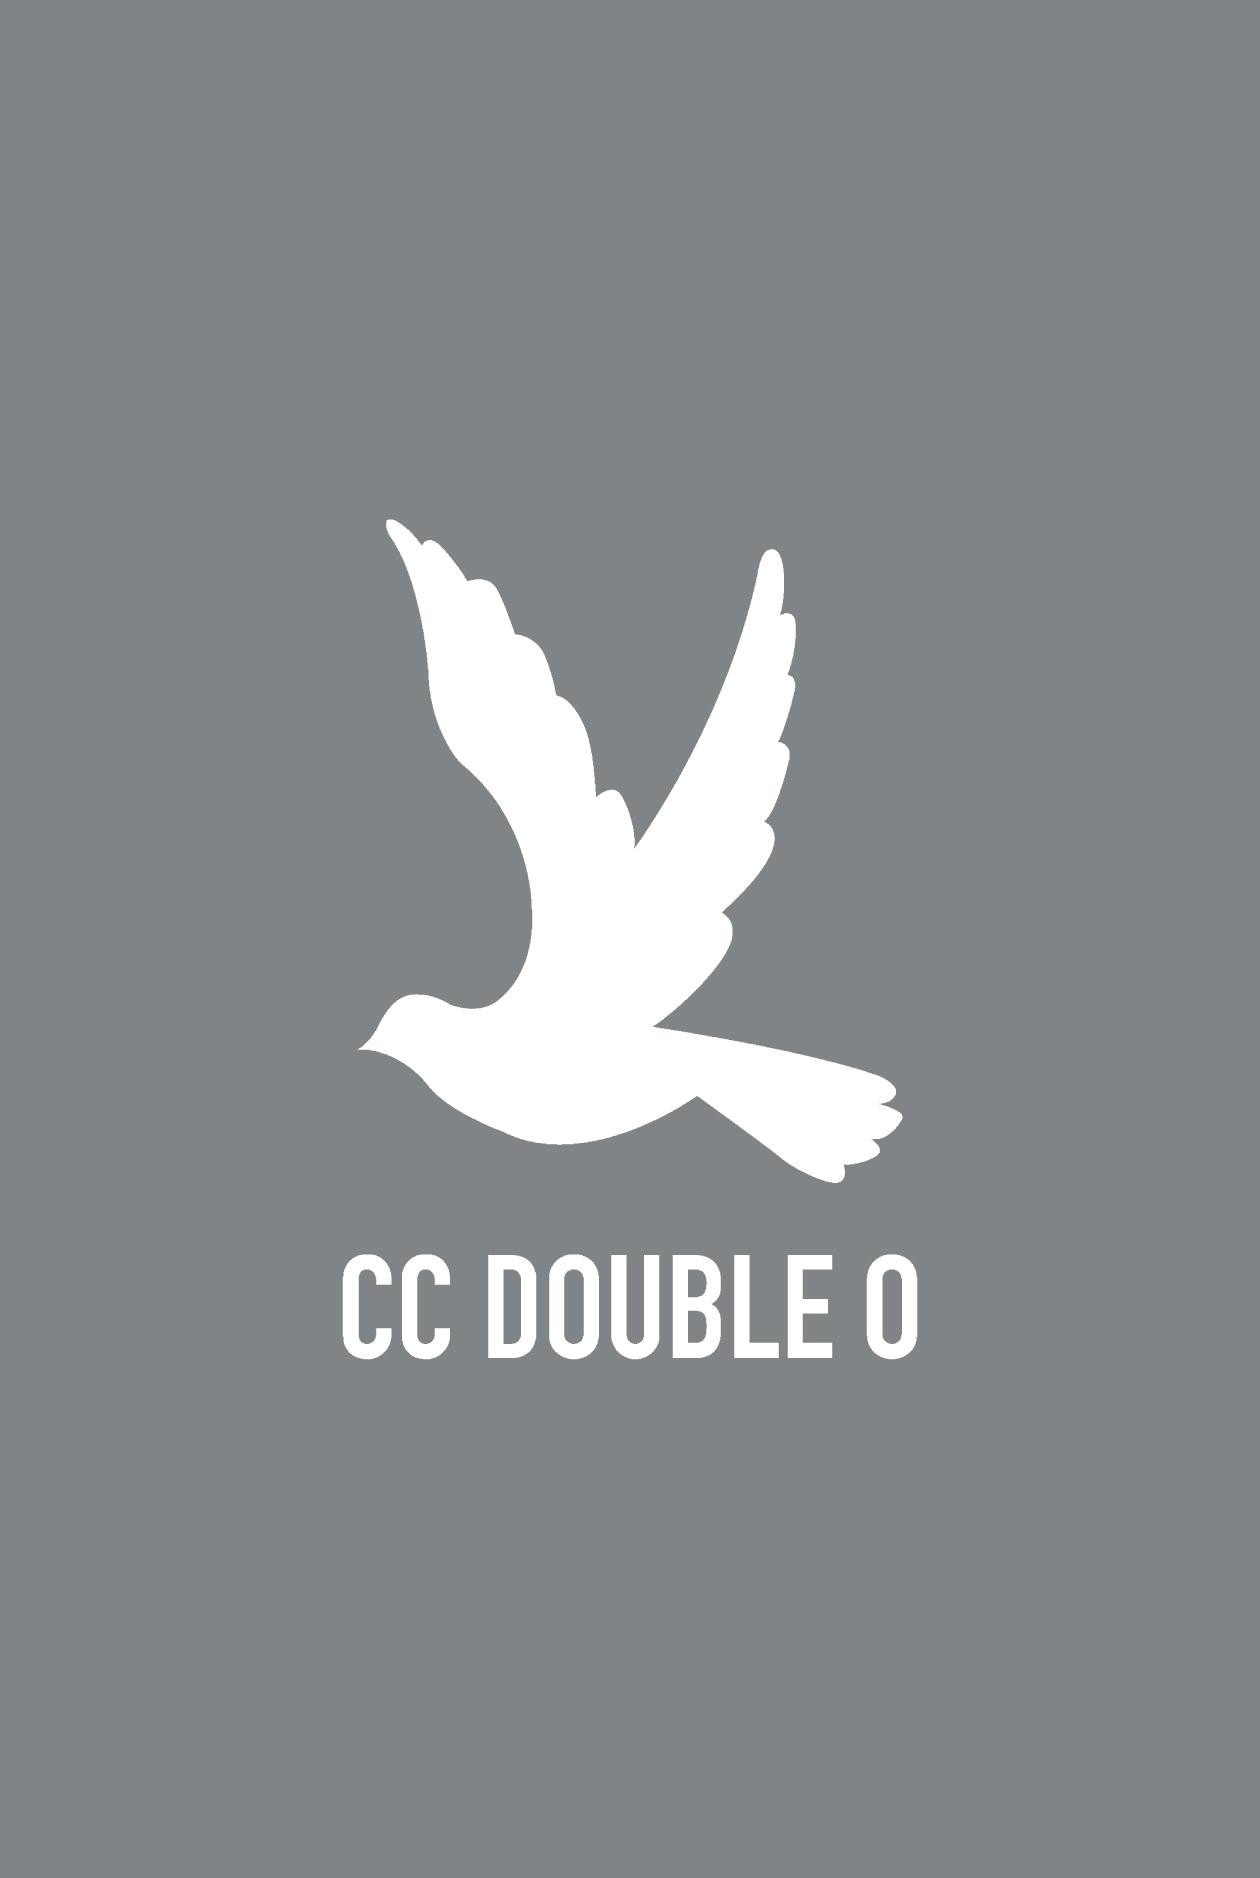 CC DOUBLE O Sweat Shorts